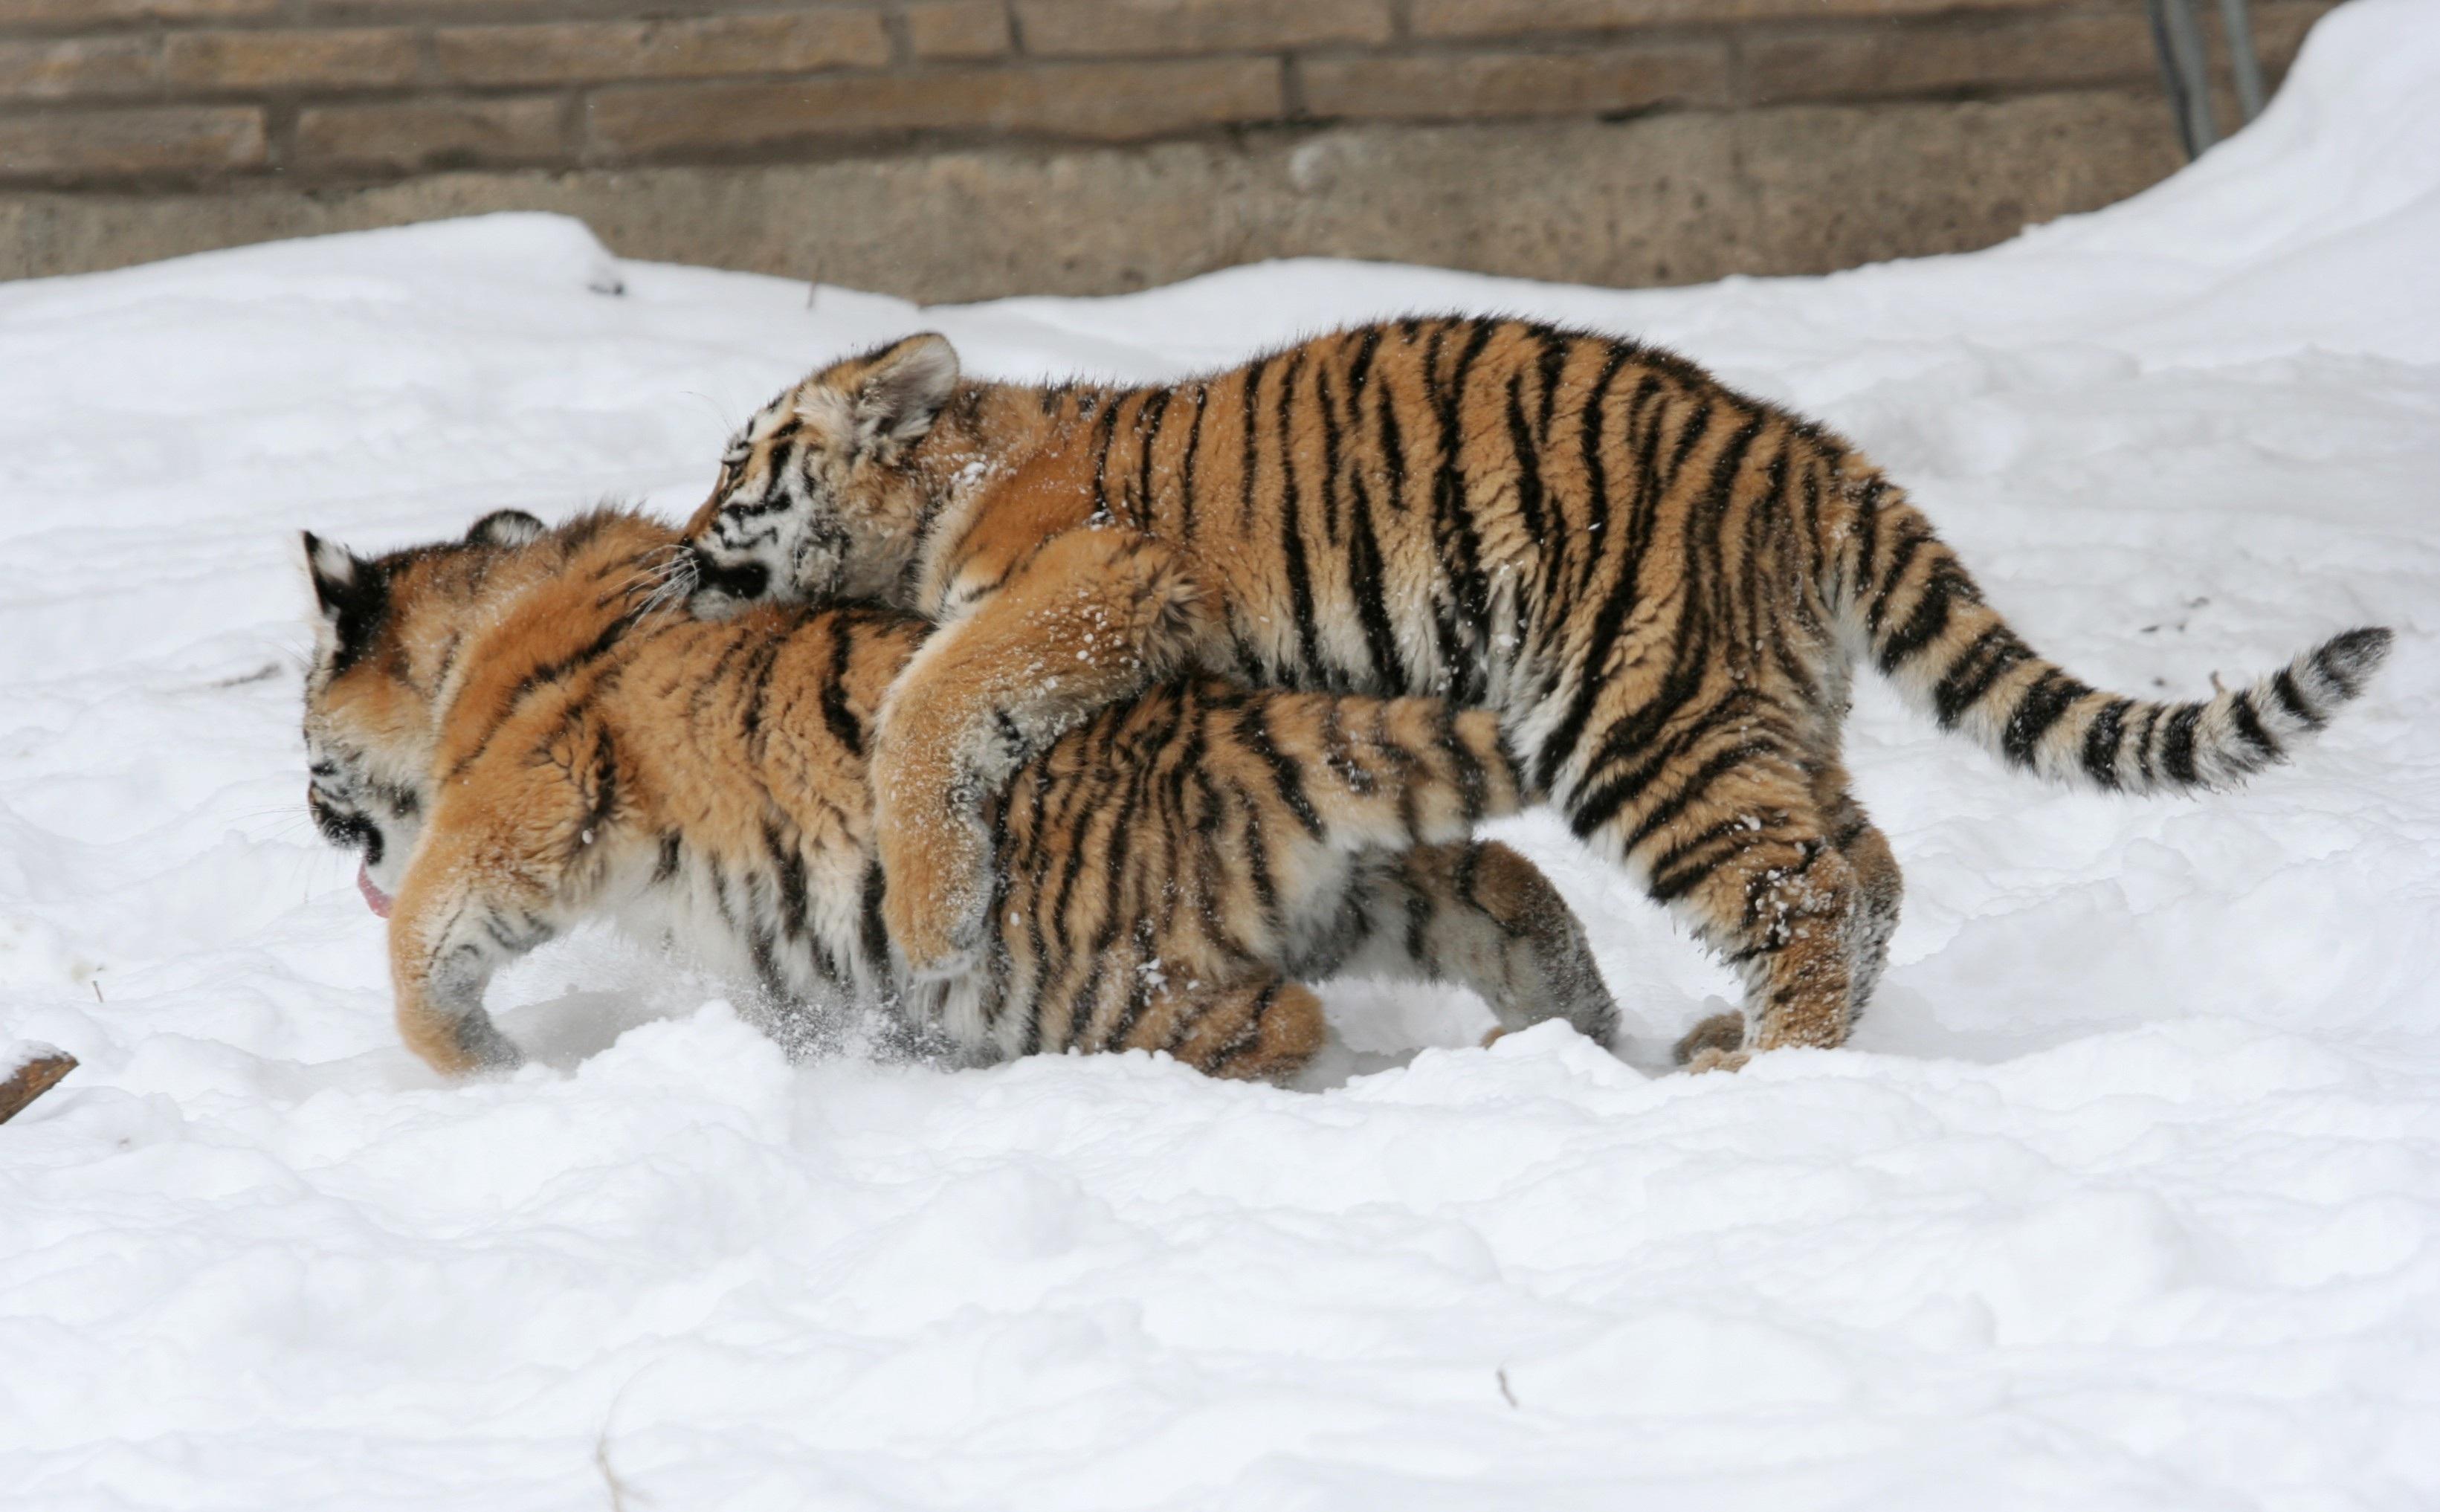 Mother's Love, Animal, Bengal, Cub, Fierce, HQ Photo